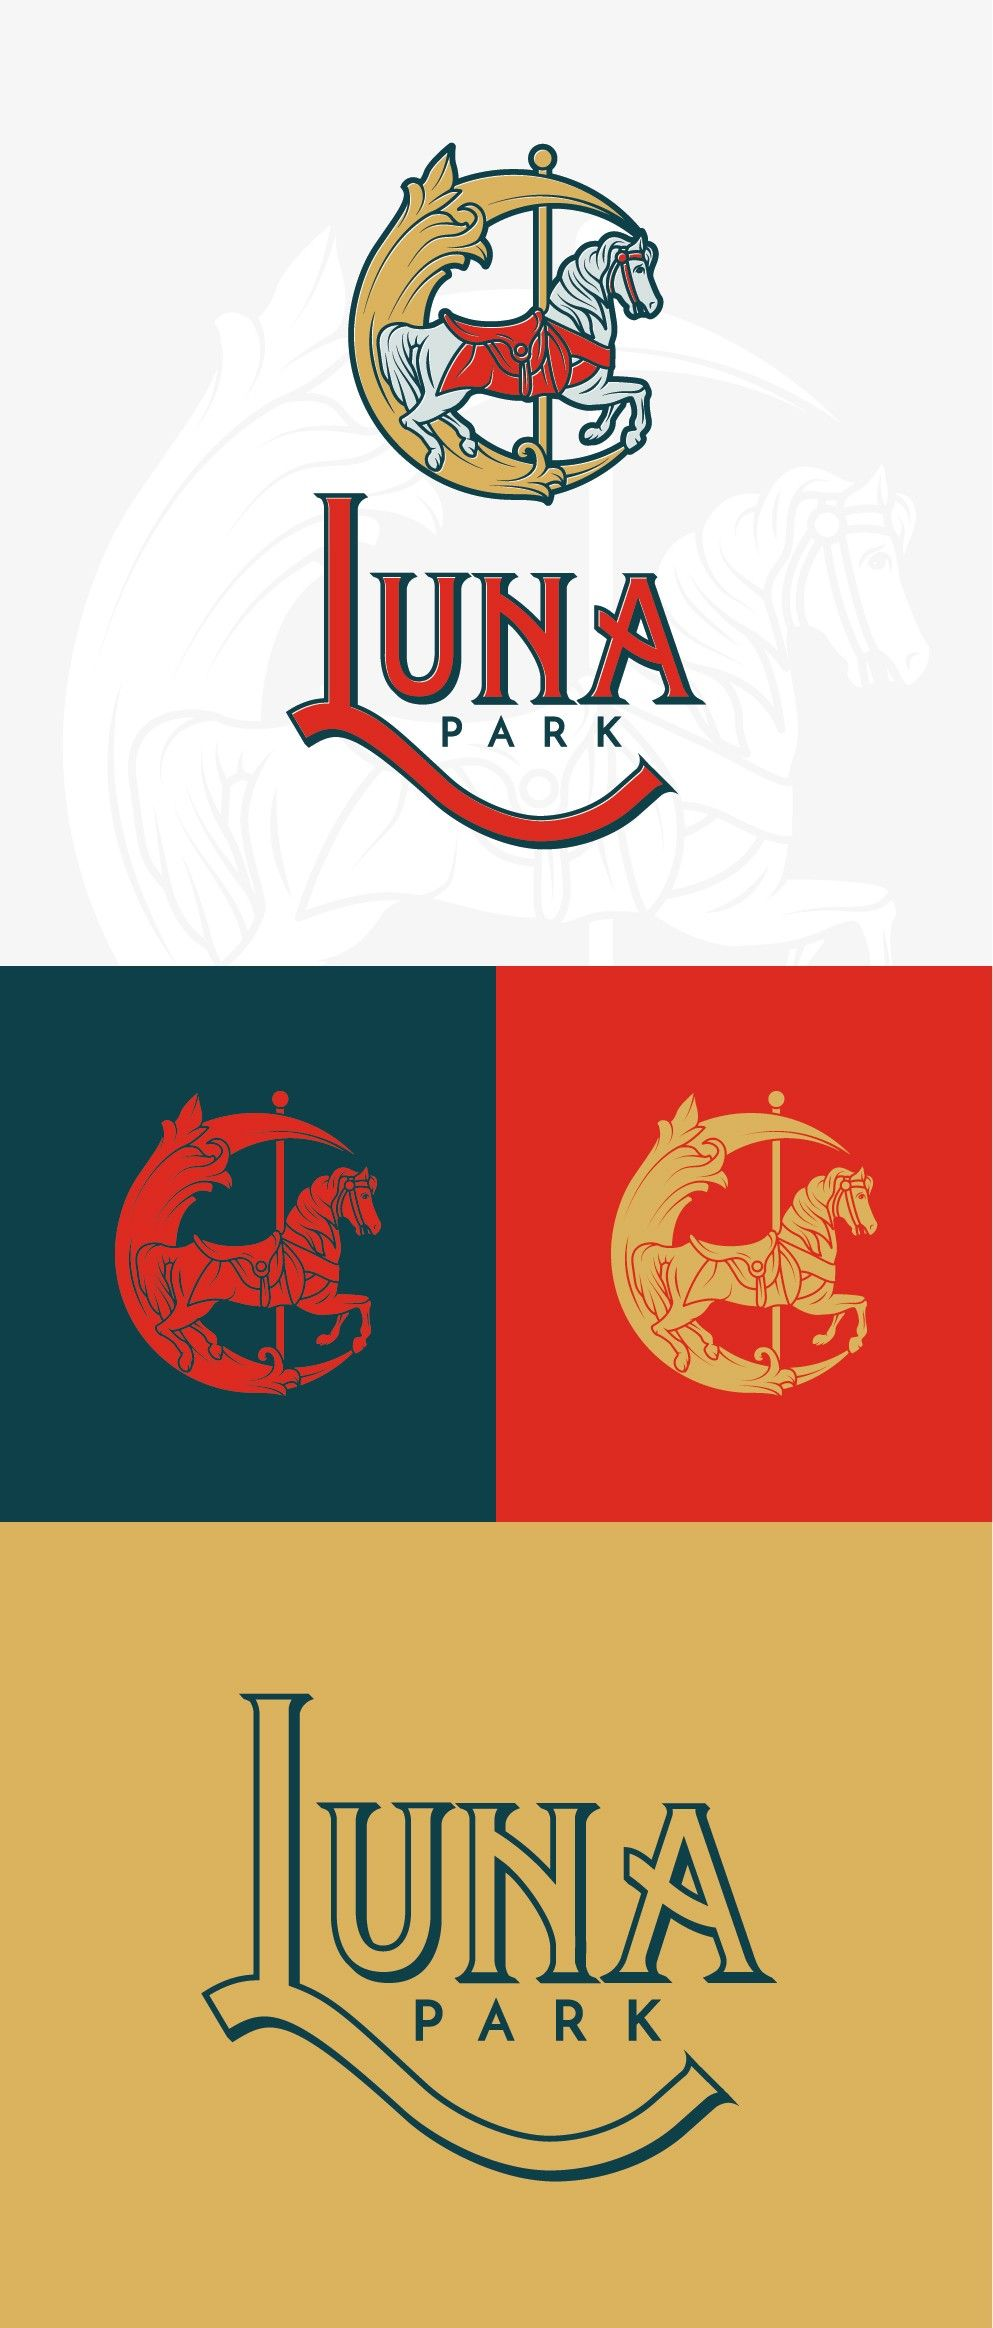 1900s Style Logo Design By Iyank Iyo For Luna Park Neighborhood Association In San Jose This Vintage Styl Association Logo Design Logo Design Logo Design Love